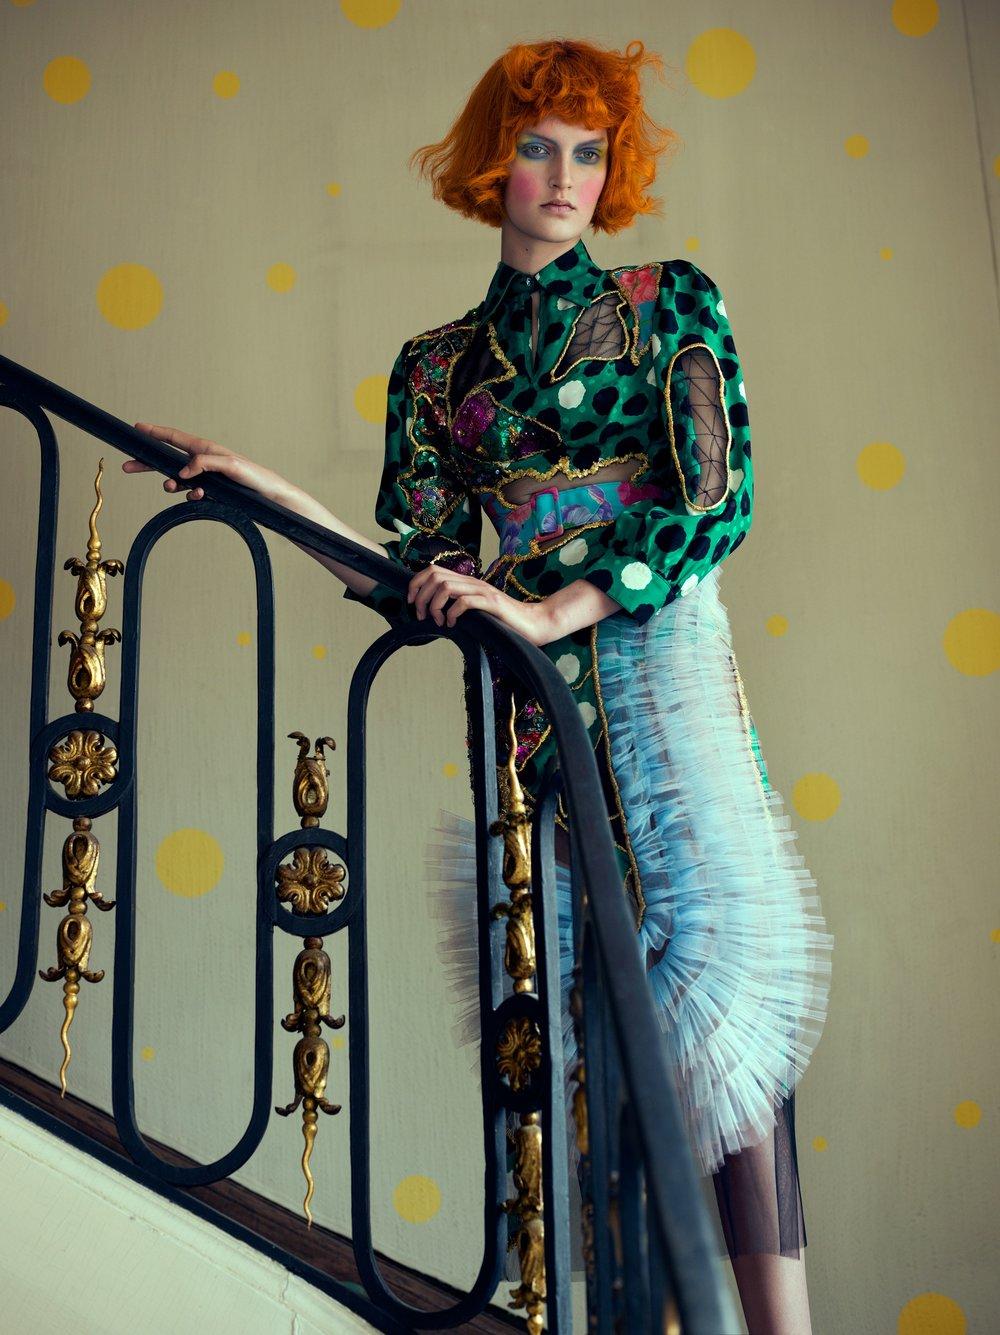 GLAMOUR ice| PHOTOGRAPHY Domen/ Van de Velde | MUAH Magdalena Loza @ House of Orange | MODEL Anouk @ Elite Models